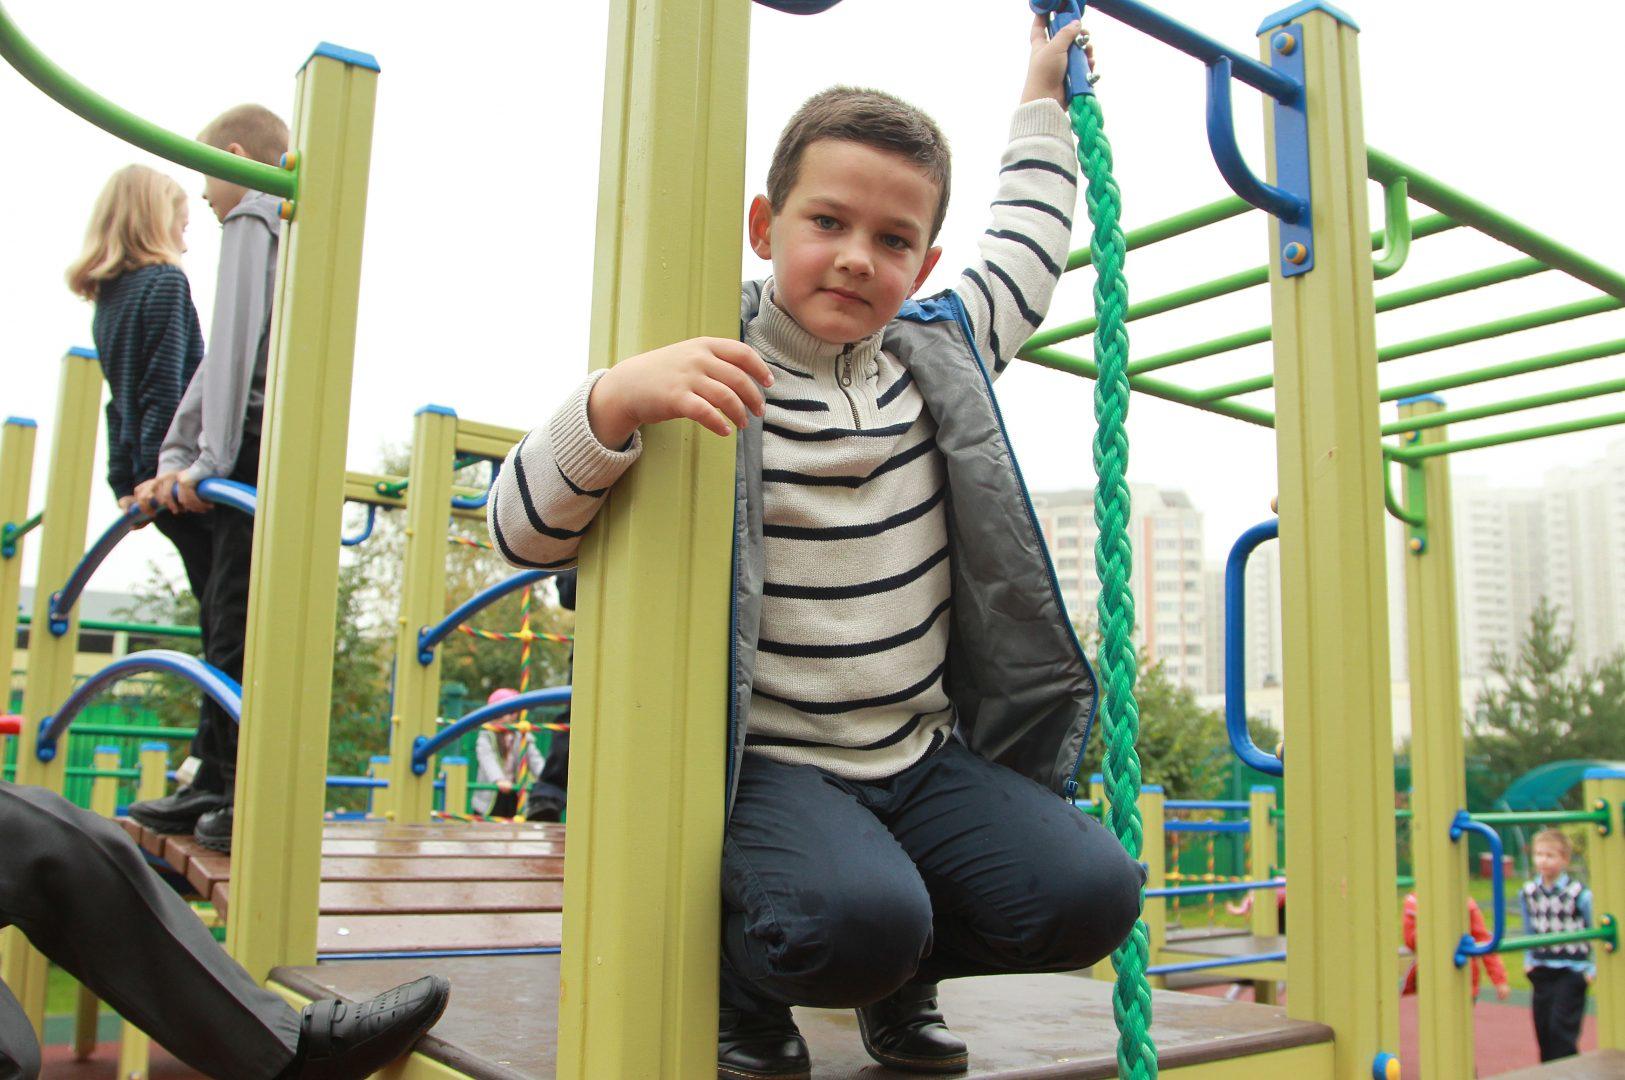 Площадка рассчитана на детей и подростков в возрасте младше 18 лет. Фото: Наталия Нечаев, «Вечерняя Москва»